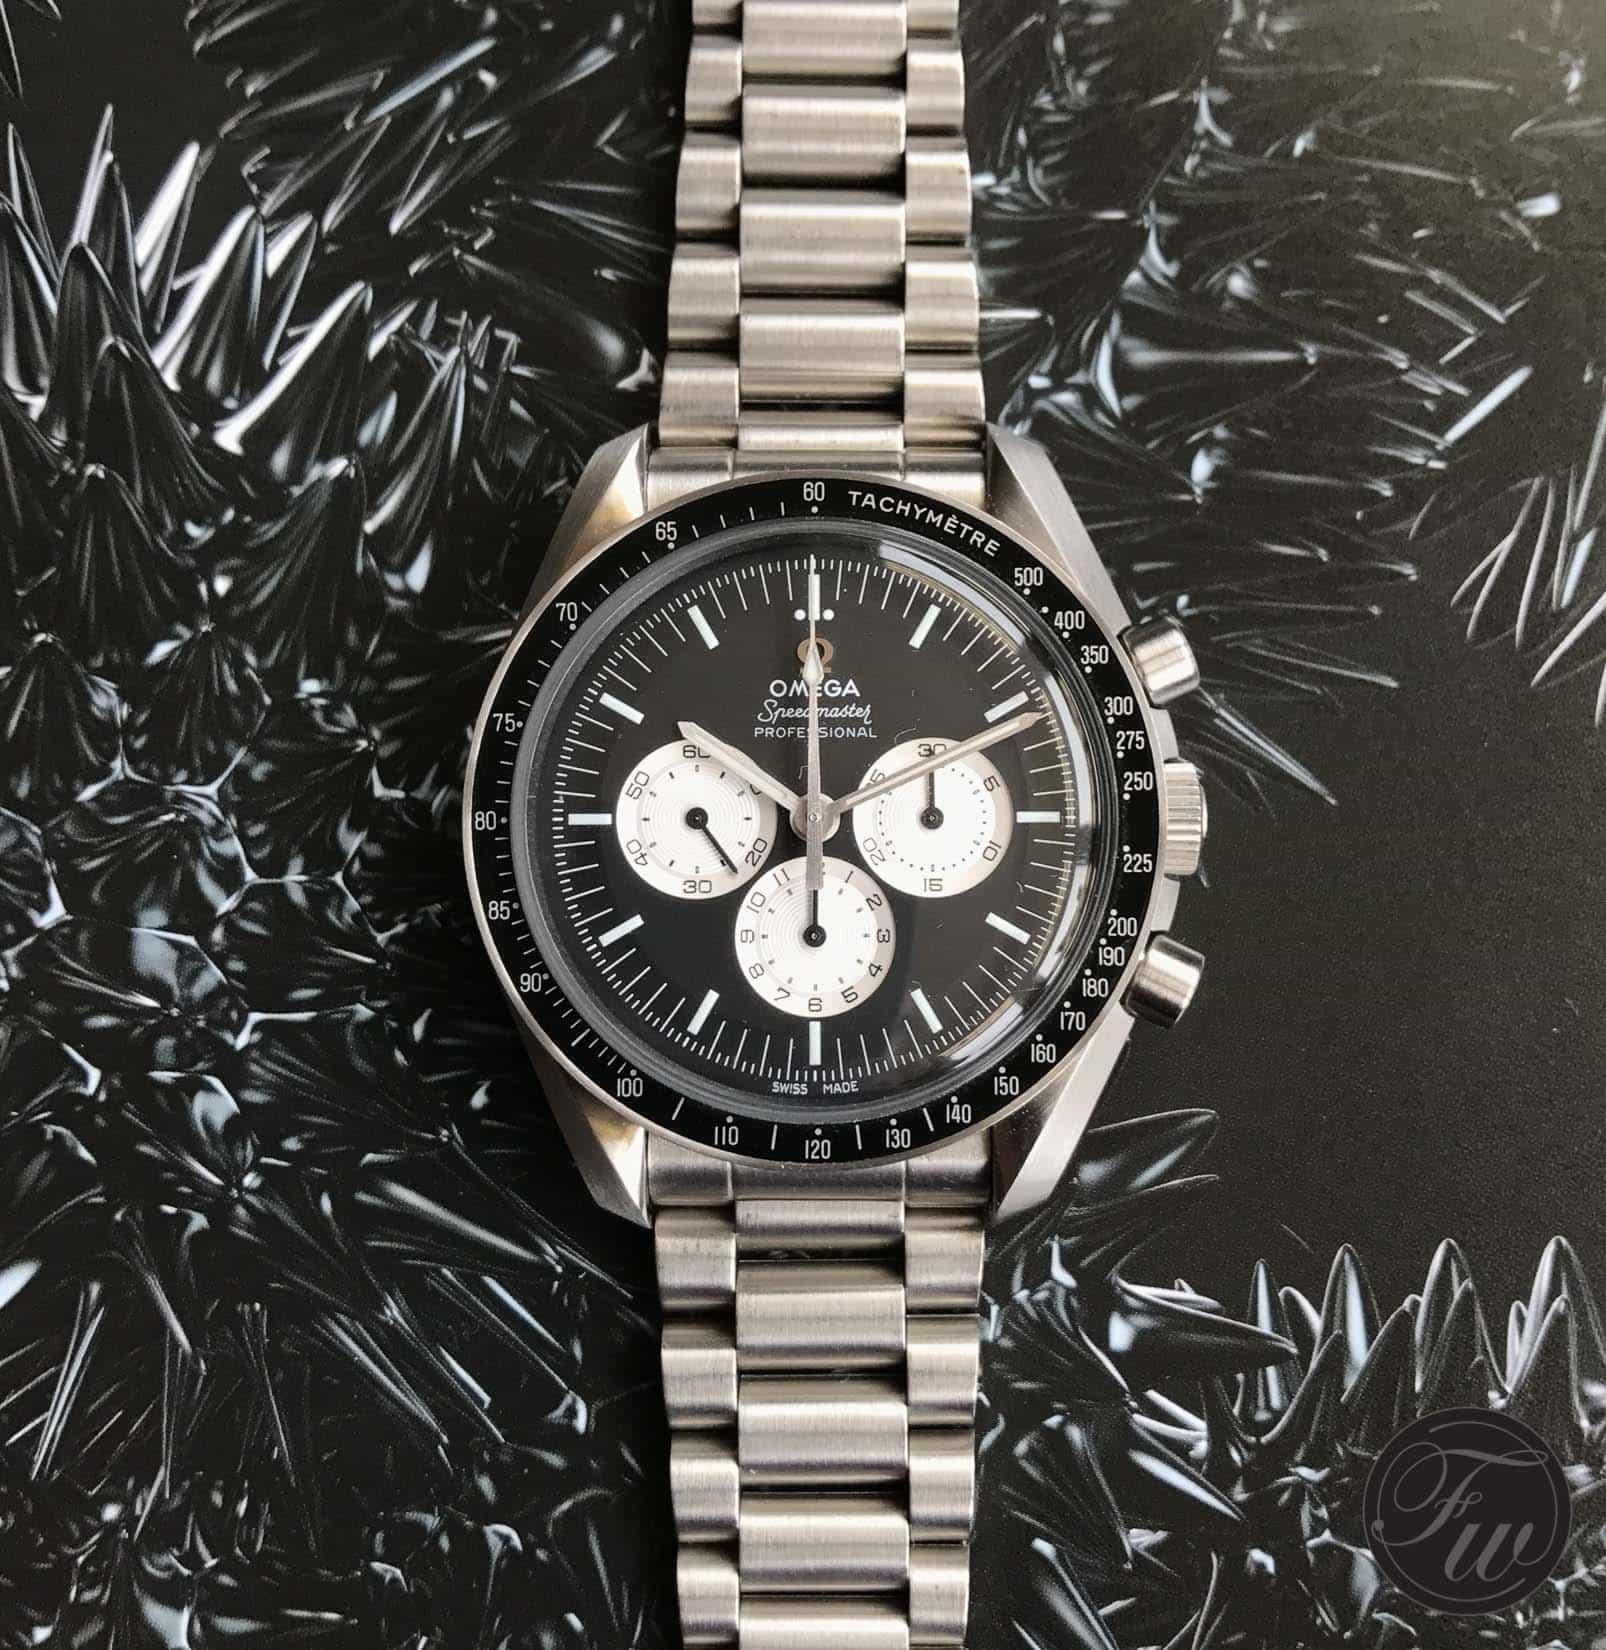 Speedy Tuesday Limited Edition 1450 bracelet